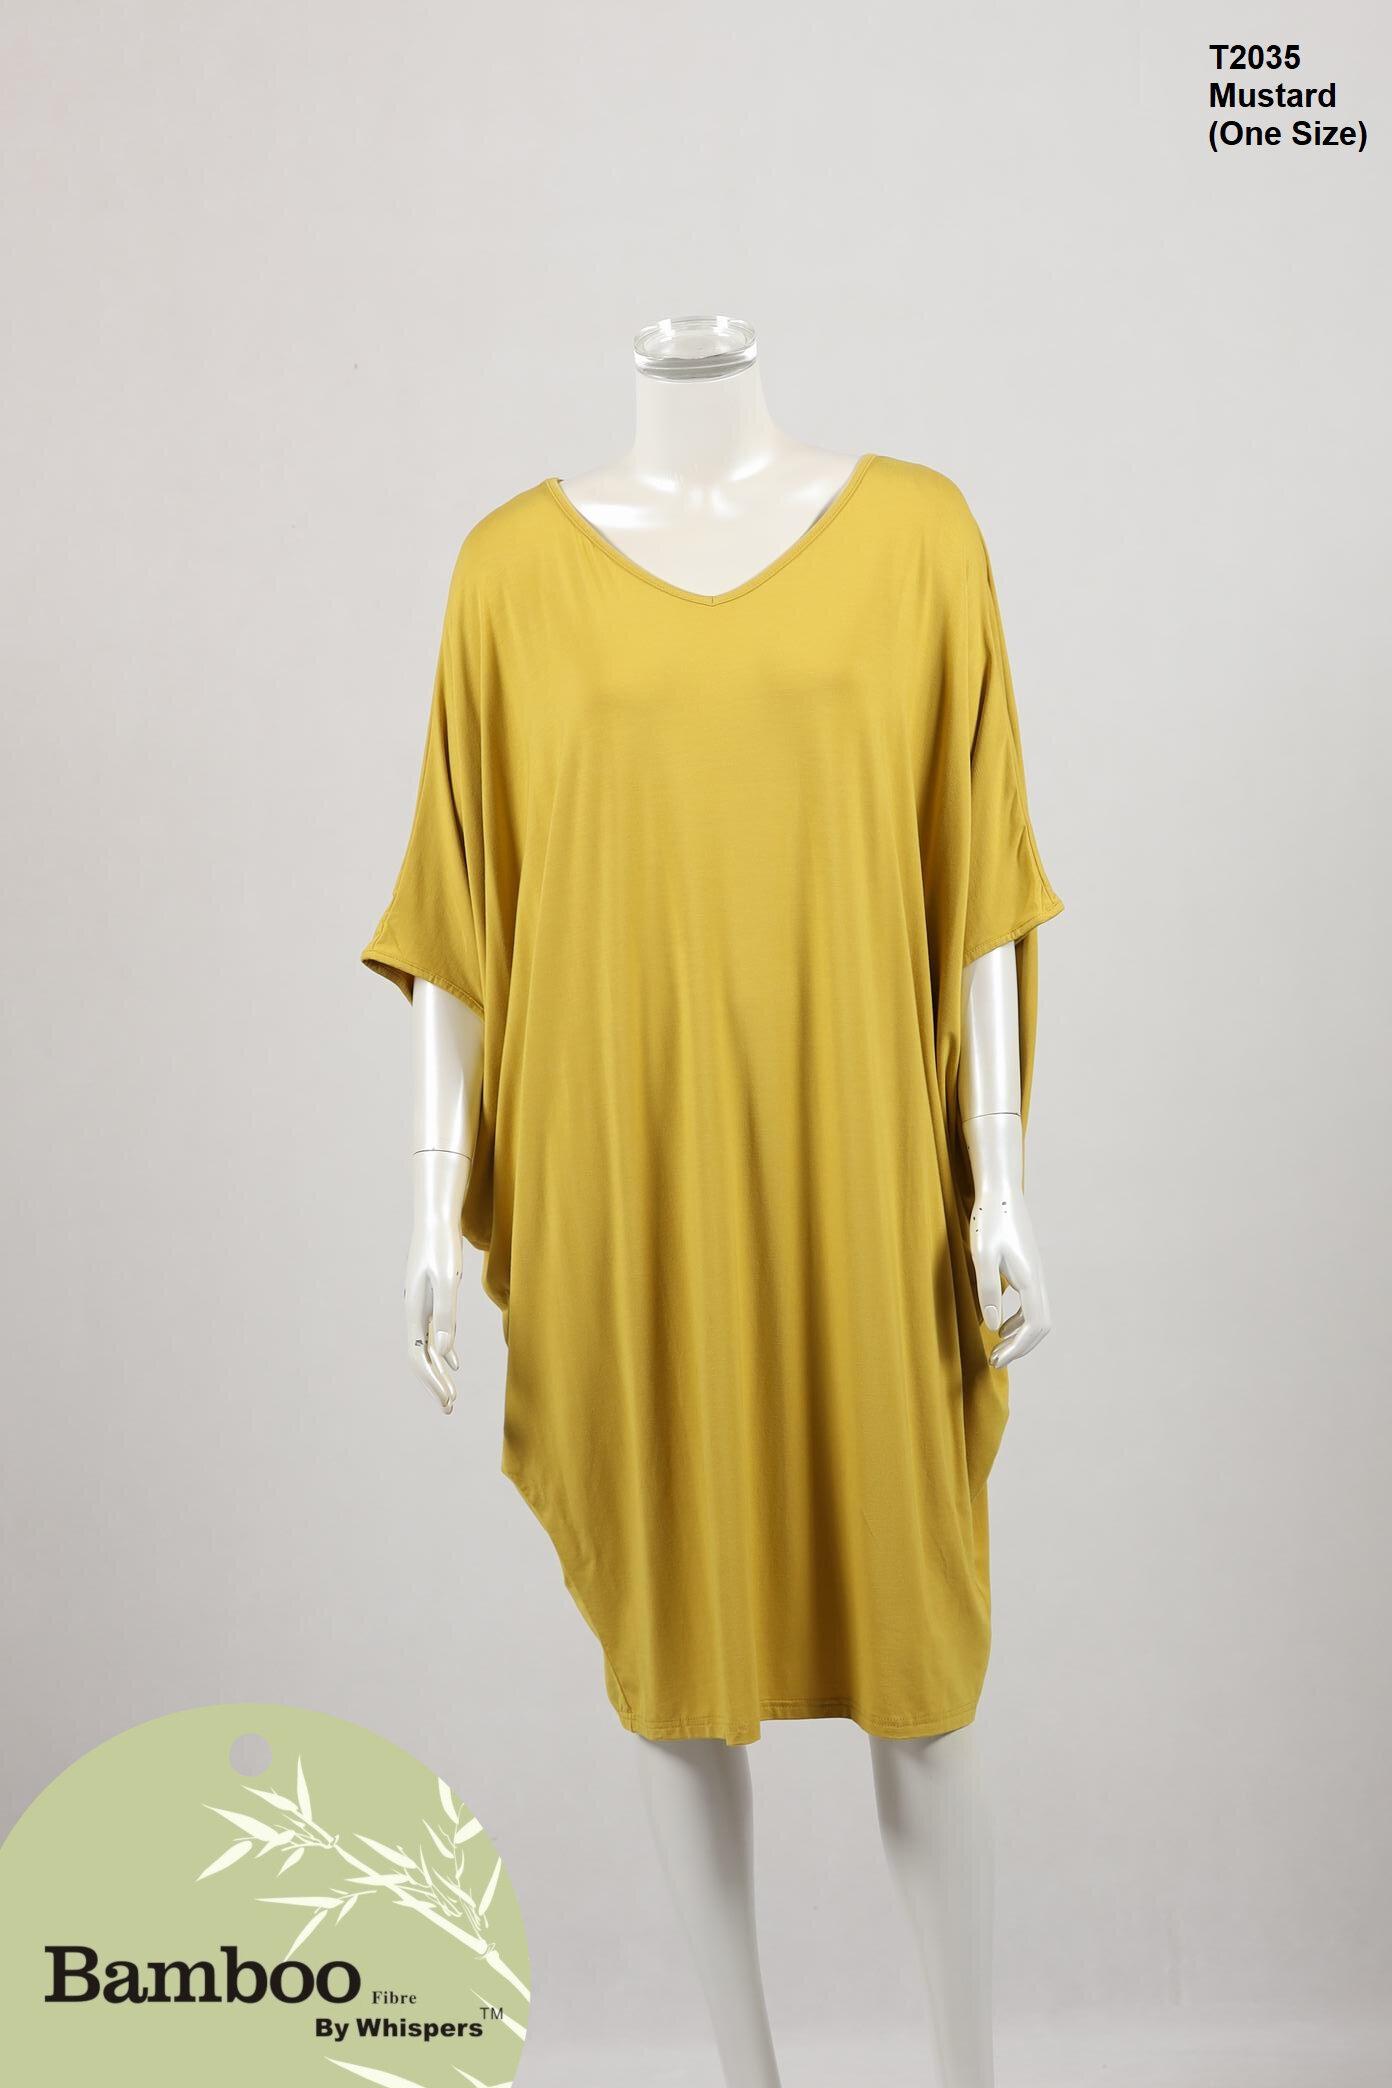 T2035-One Size-Mustard.JPG